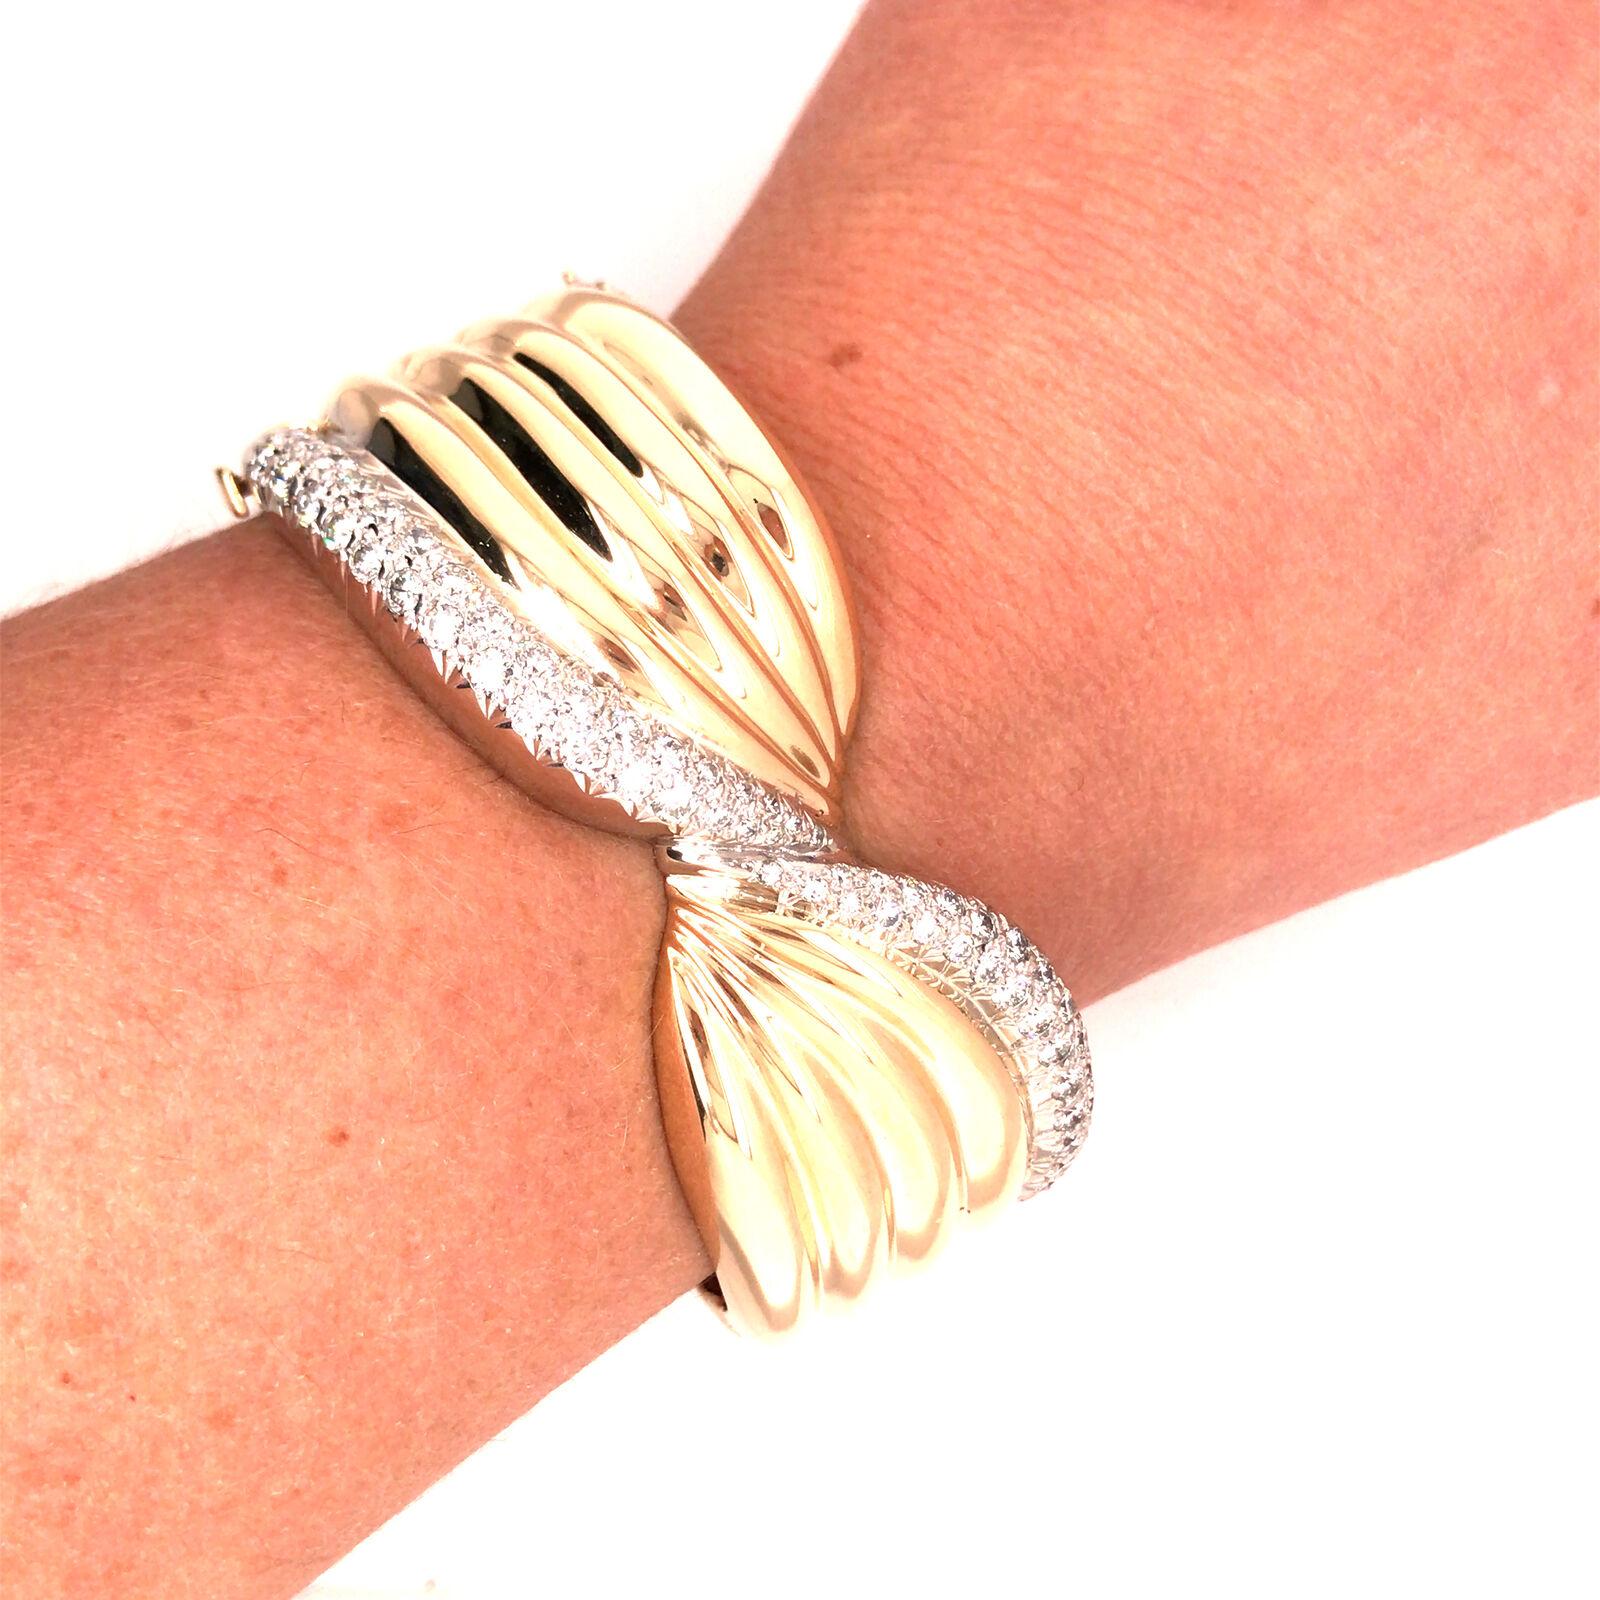 14K Wide Diamond Twist Cuff Two-Tone Gold - image 7